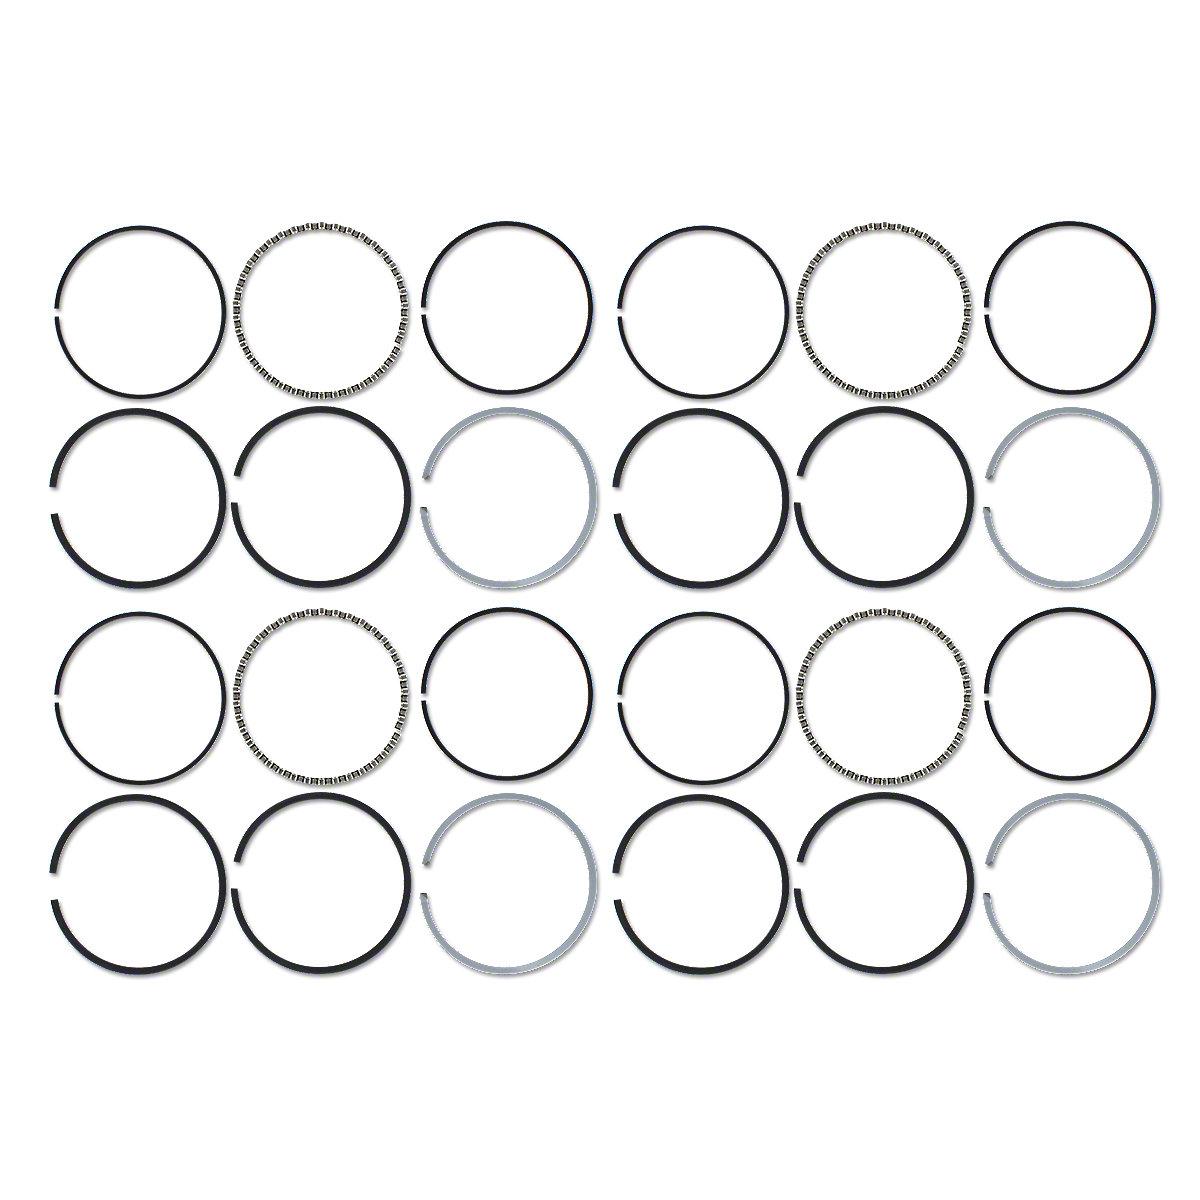 Piston Ring Set For Farmall B250, B275, B276, B414, 356, 364, 384, 424, 434, 444, 2444, 3414, 3444.